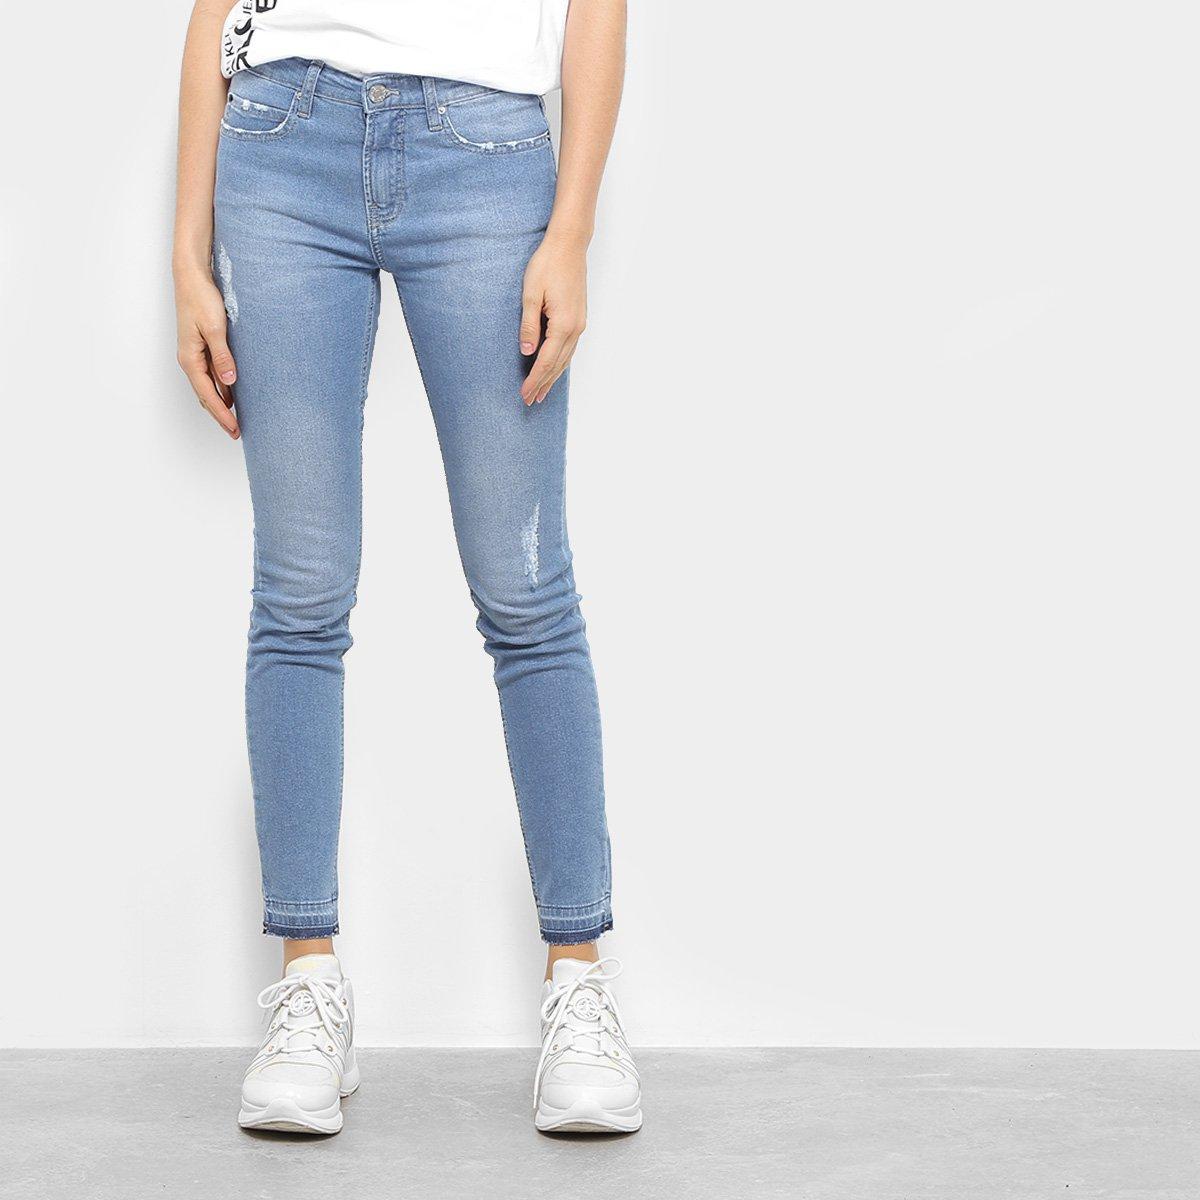 45218c55cc7389 Calça Jeans Skinny Calvin Klein Five Pocket Feminina